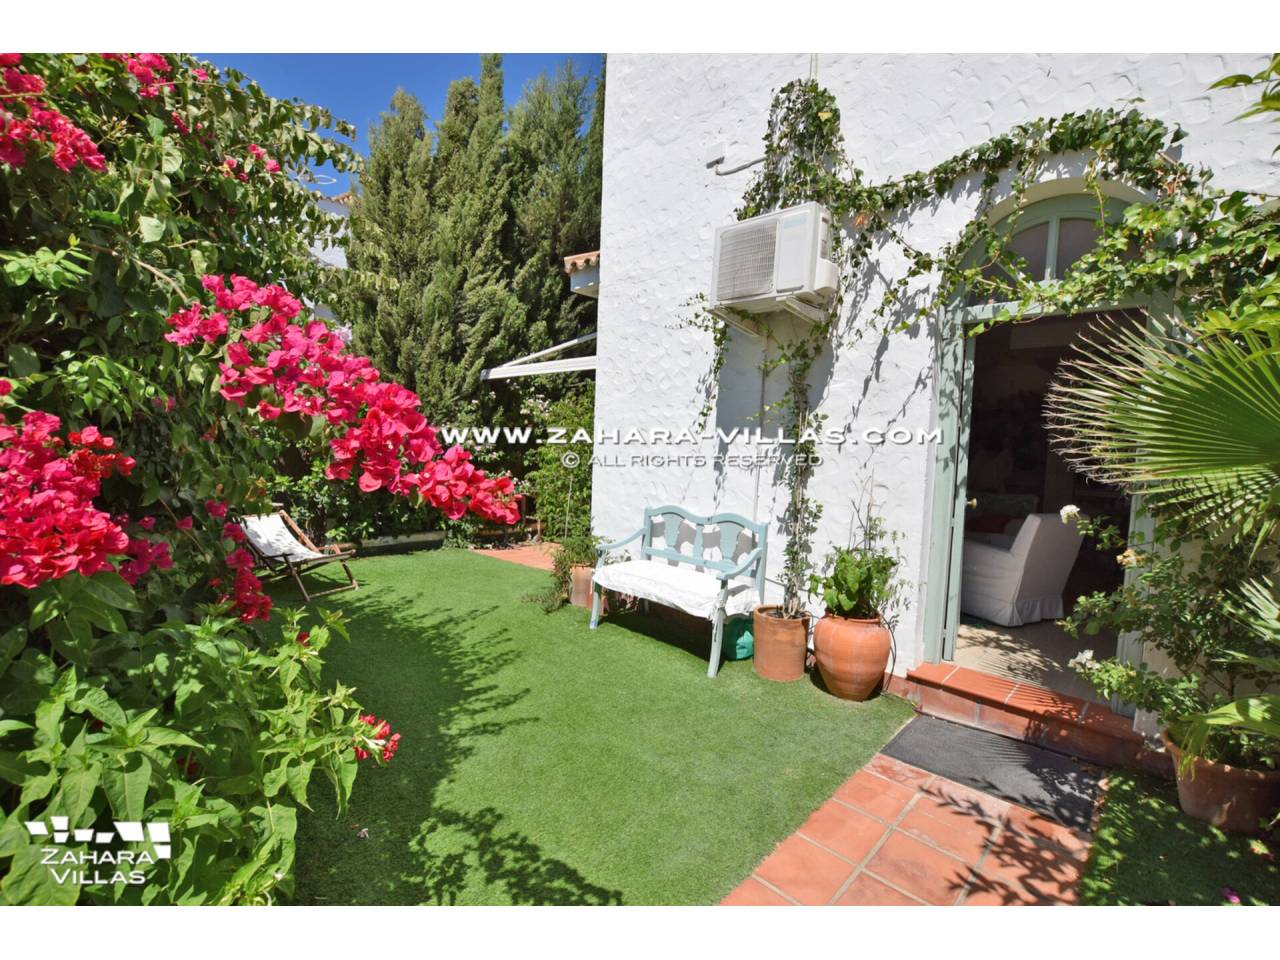 Imagen 16 de House for sale close to the beach, with sea views in Zahara de los Atunes